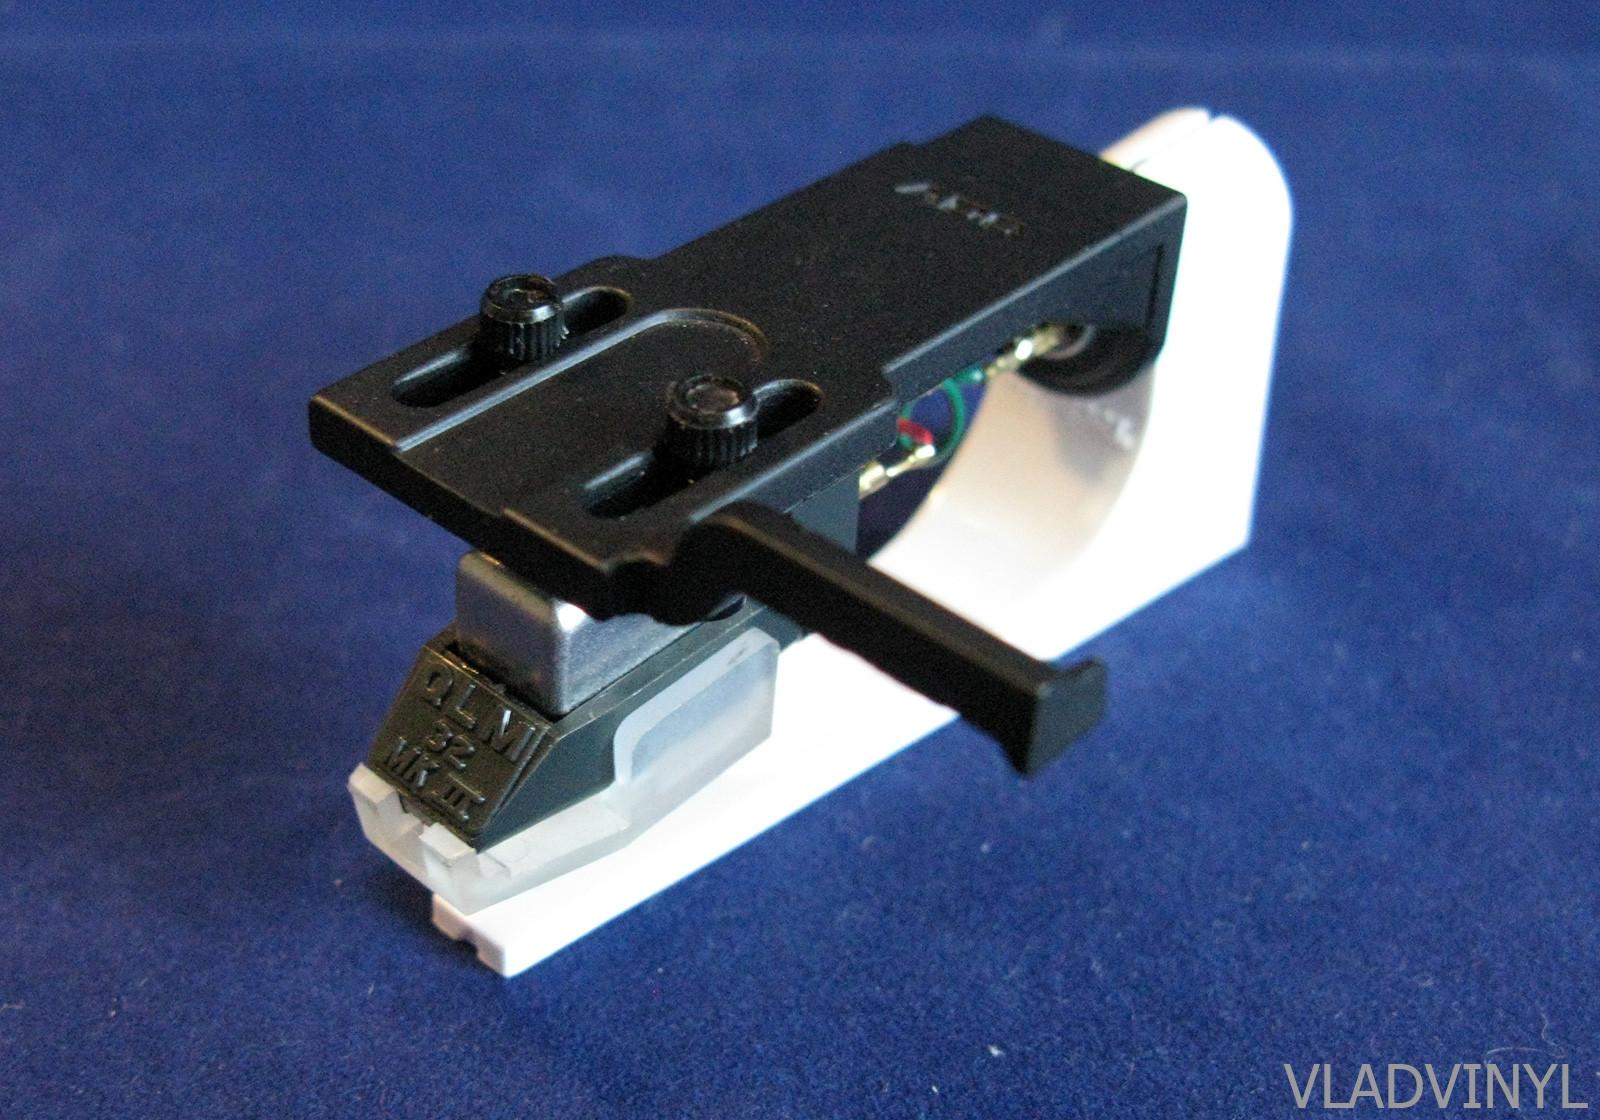 ADC QLM-32 MK3, игла ADC RSQ-32, шелл ADC LMG-1